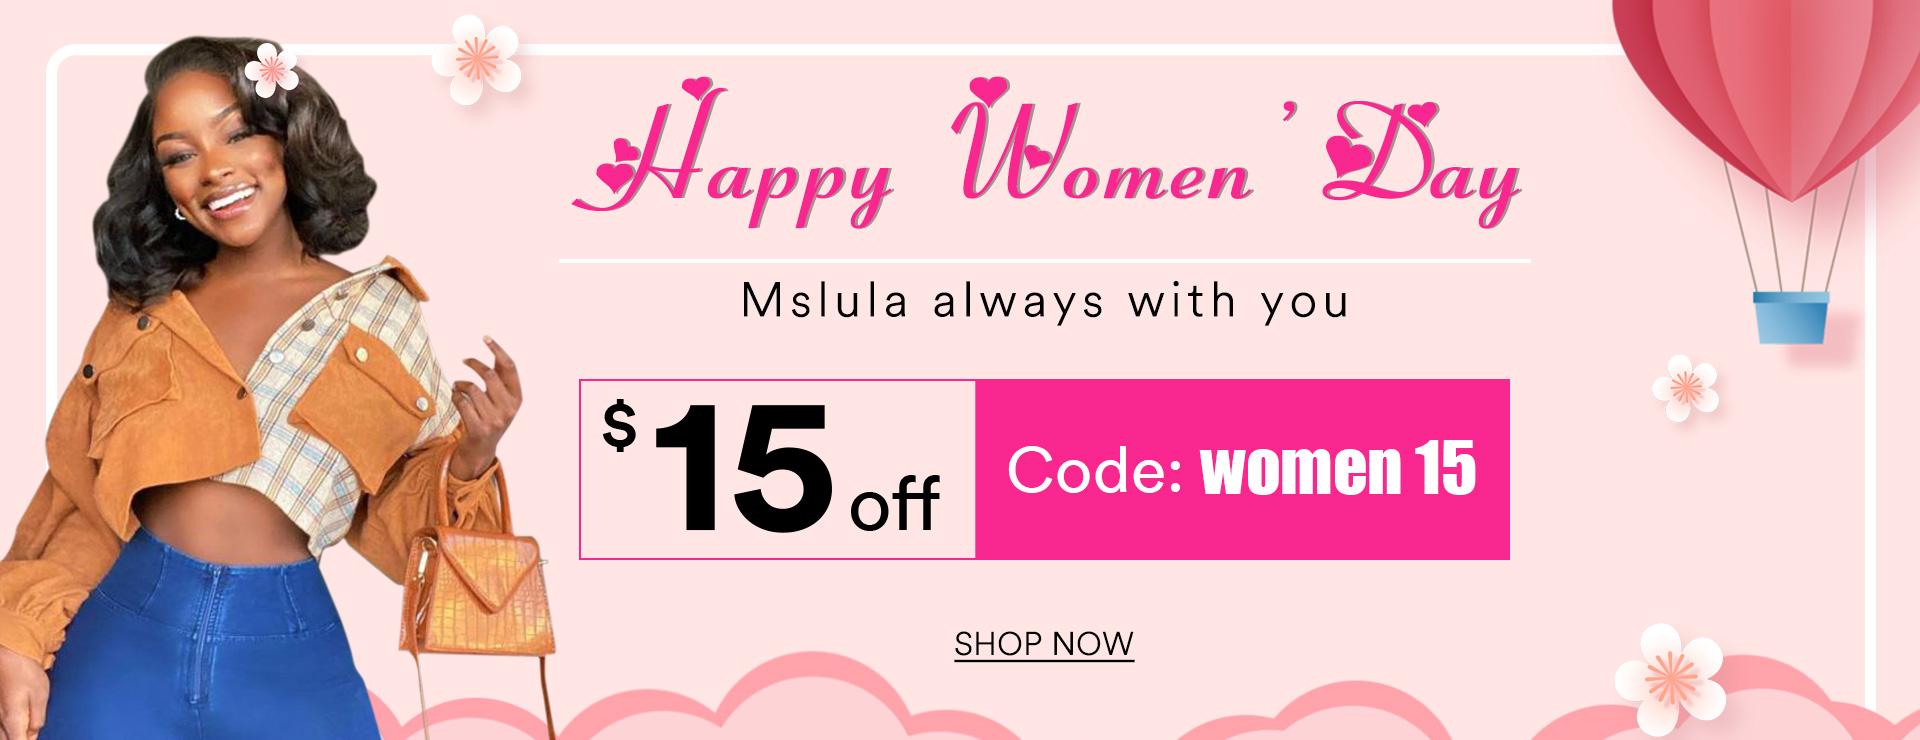 Happy Women's Dday